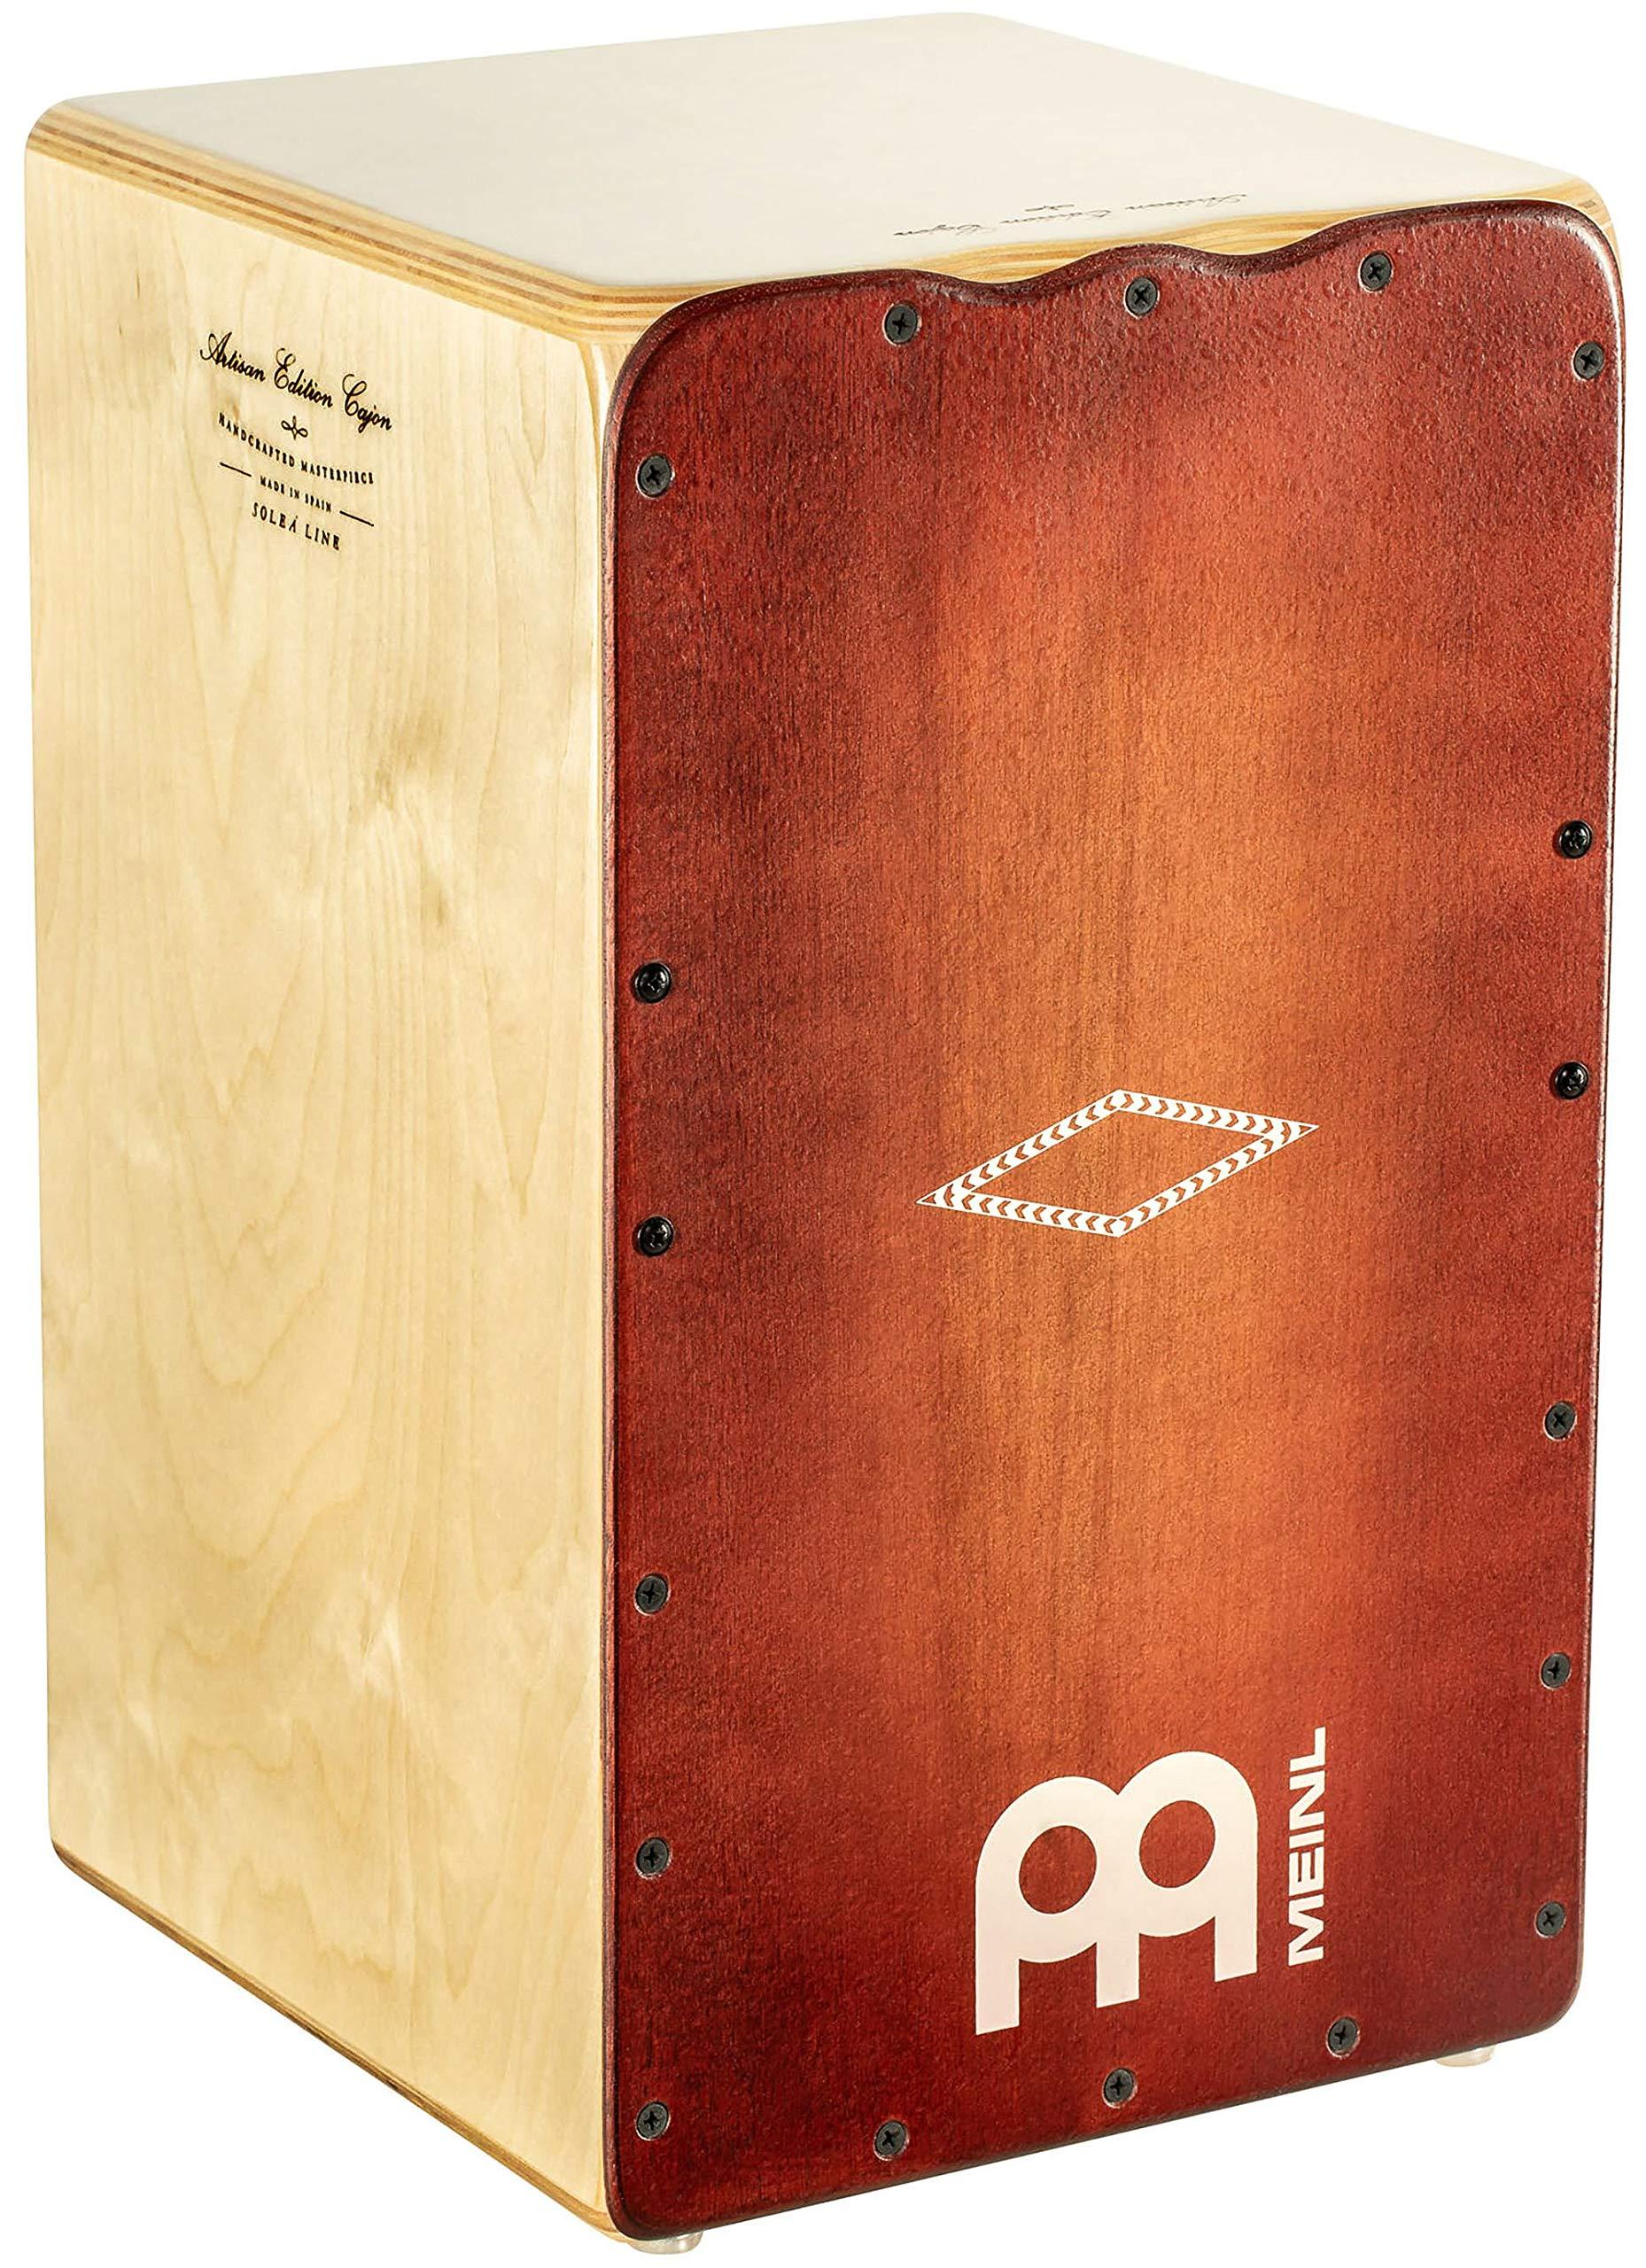 Meinl Artisan String Cajon with Dark Red Burst Frontplate / Baltic Birch Body - MADE IN SPAIN - Soleá Line, 2-YEAR WARRANTY (AESLRB) by Meinl Percussion (Image #1)